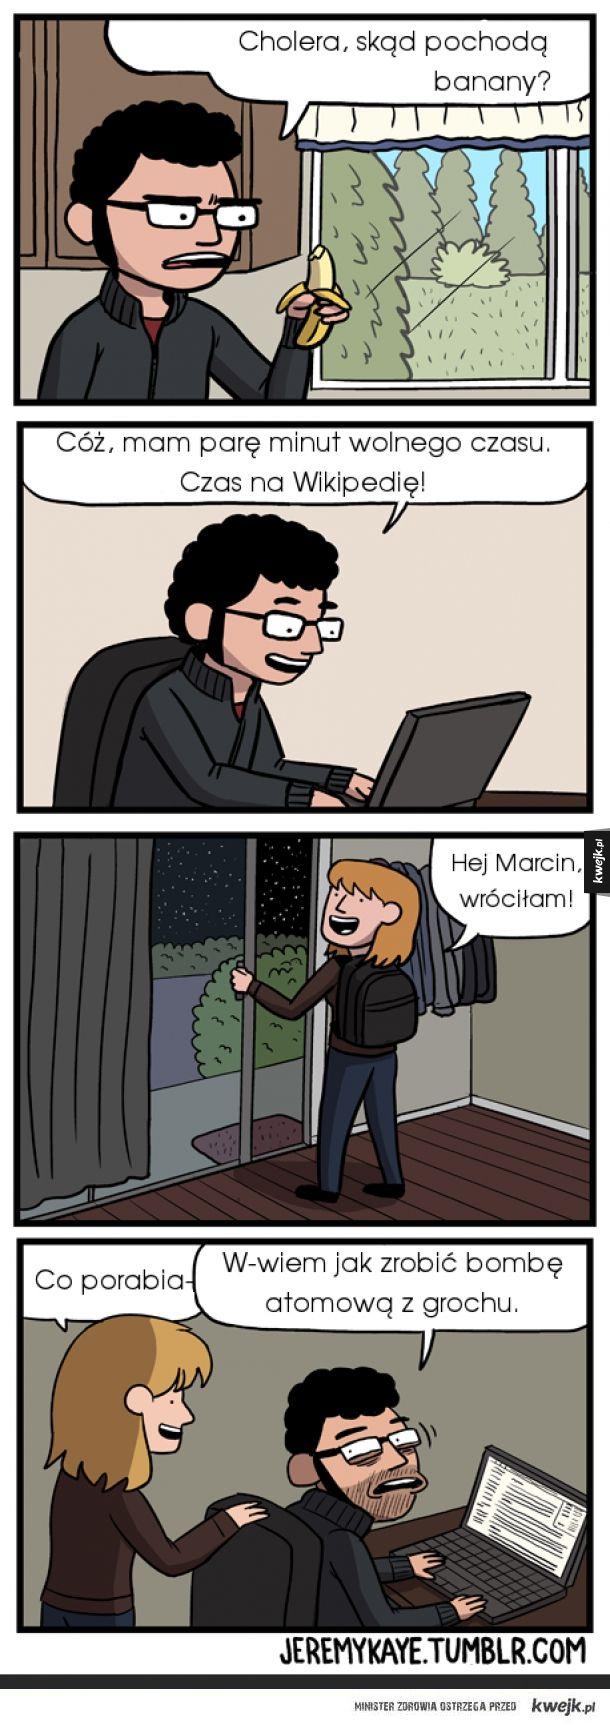 Internet wciąga